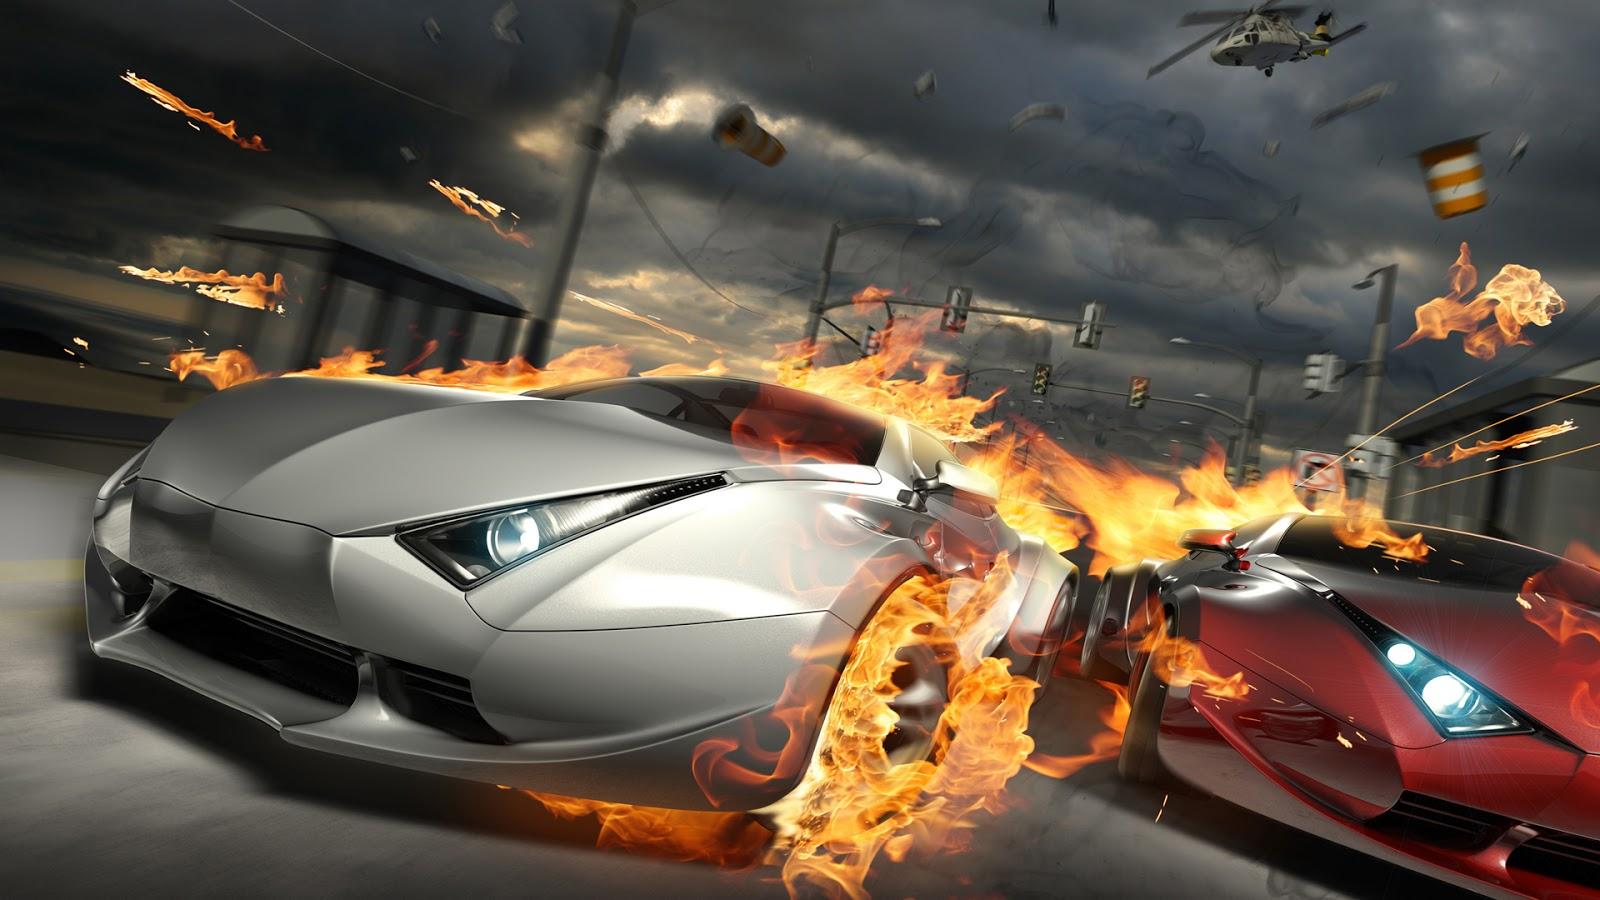 burning car race hd 1080p burnout revenge car accident wallpaper car 1600x900